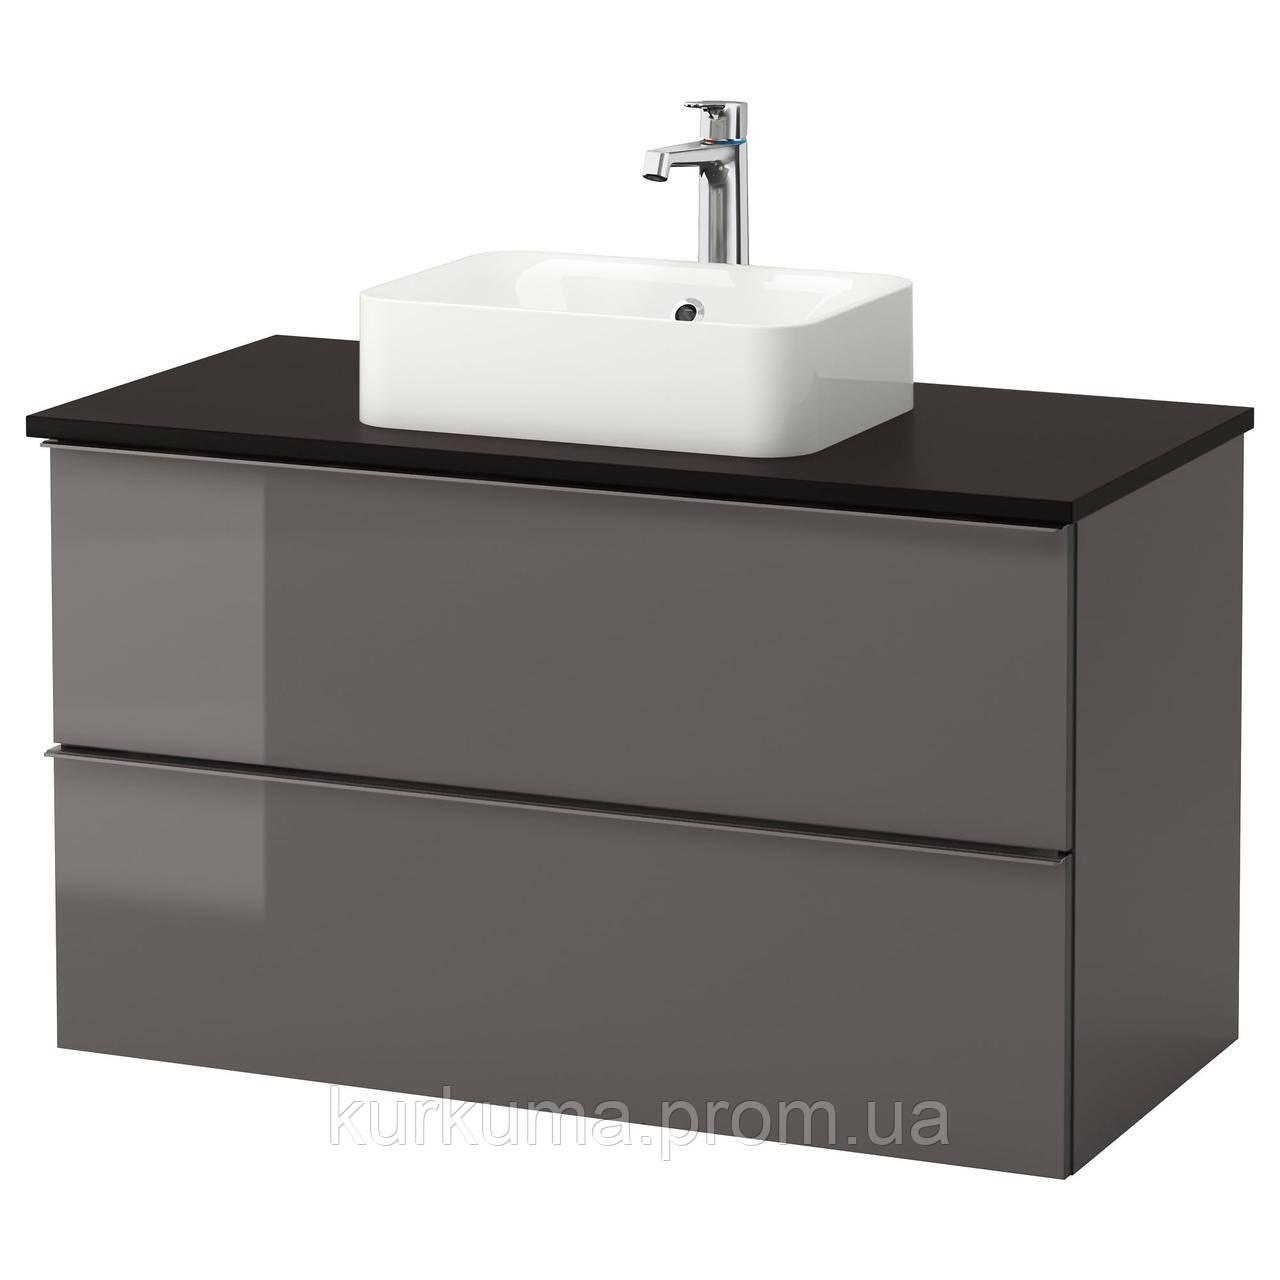 IKEA GODMORGON/TOLKEN/HORVIK Шкаф под умывальник с раковиной 45x32, глянцевый серый, антрацит  (192.088.11)